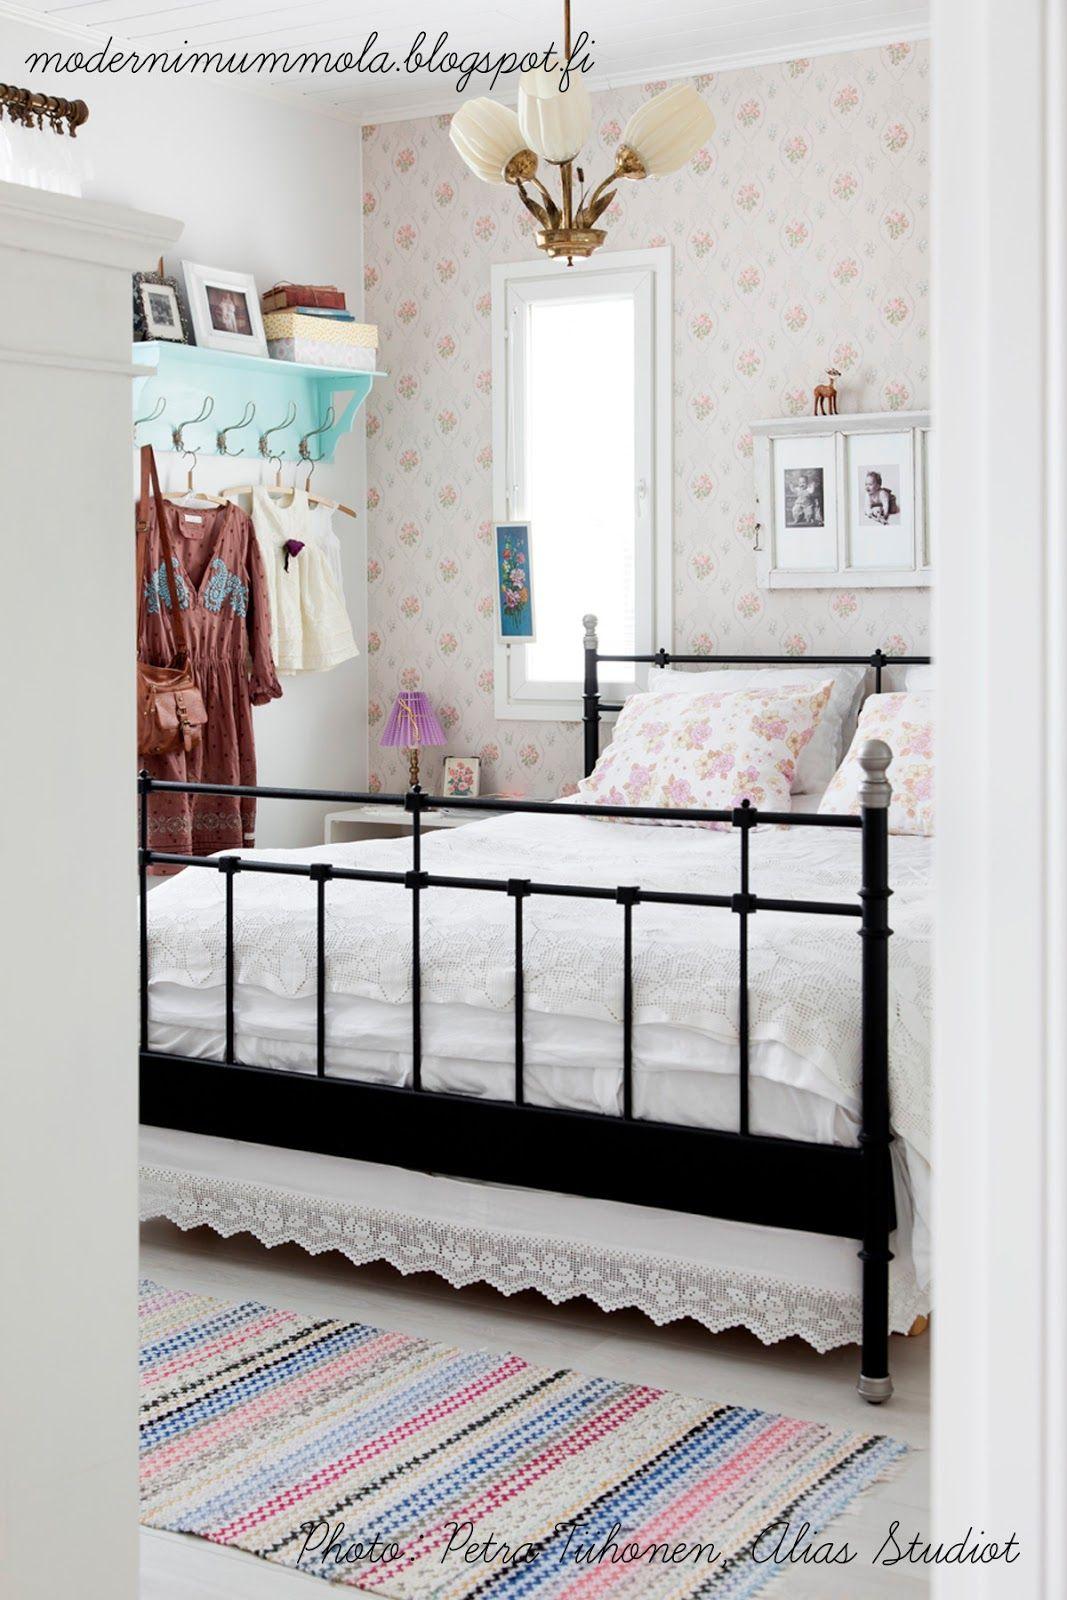 Moderni mummola modernisti vanha makuuhuone pinterest